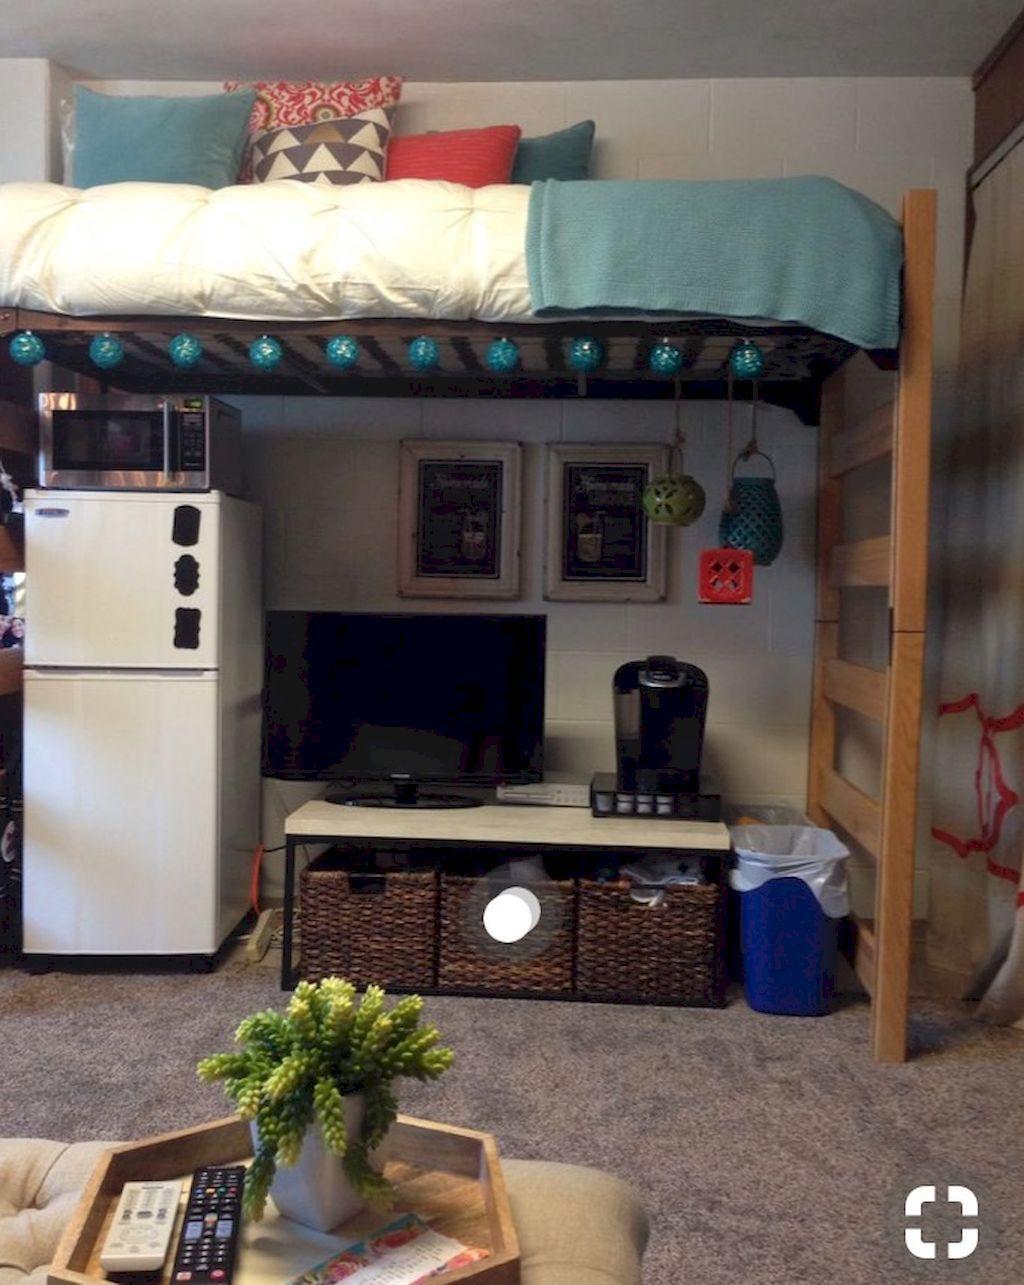 College loft bed ideas   Cute Loft Beds College Dorm Room Design Ideas For Girl  Dorm